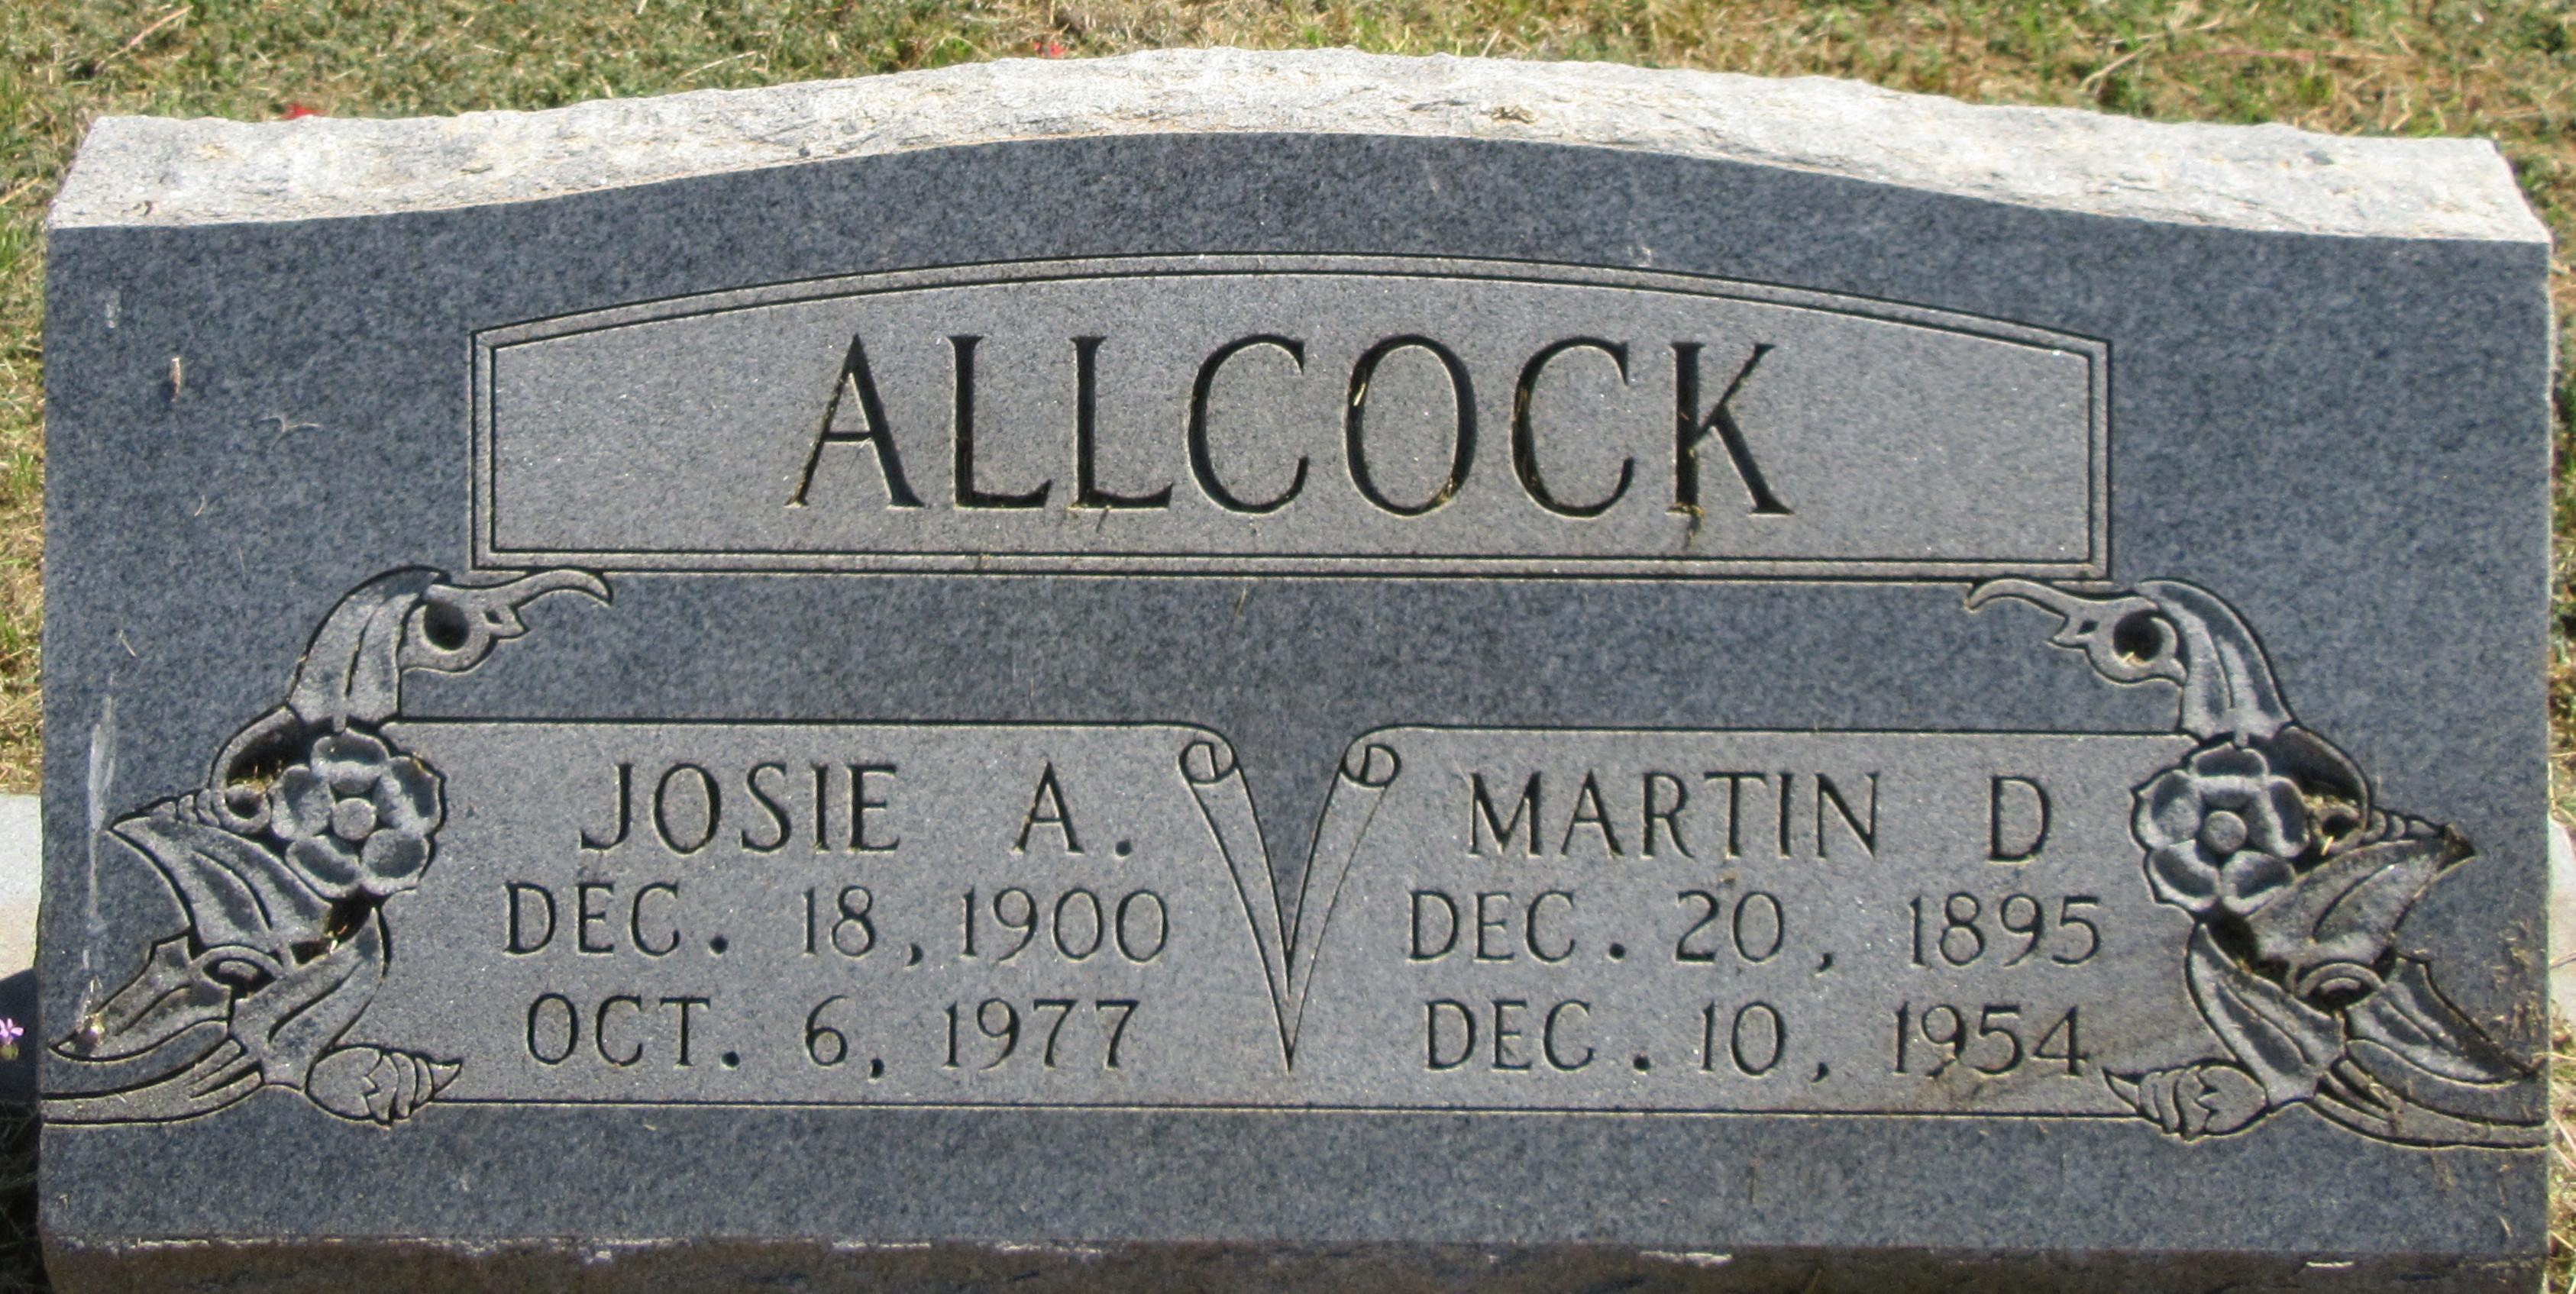 Martin Denver Allcock